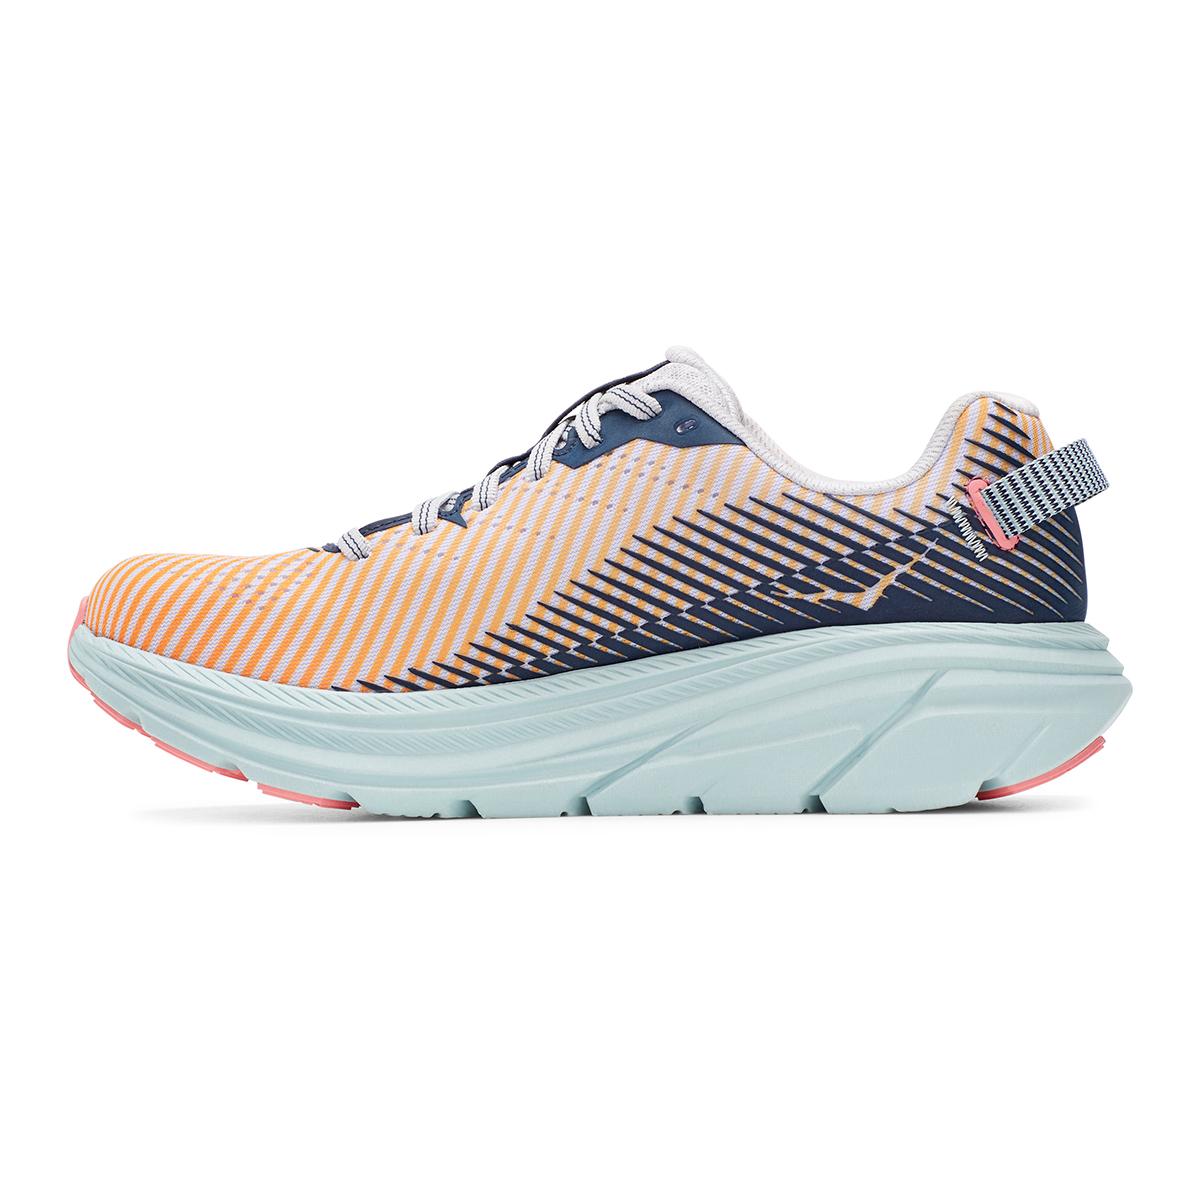 Women's Hoka One One Rincon 2 Running Shoe - Color: Lunar Rock/Black Iris - Size: 7 - Width: Regular, Lunar Rock/Black Iris, large, image 6